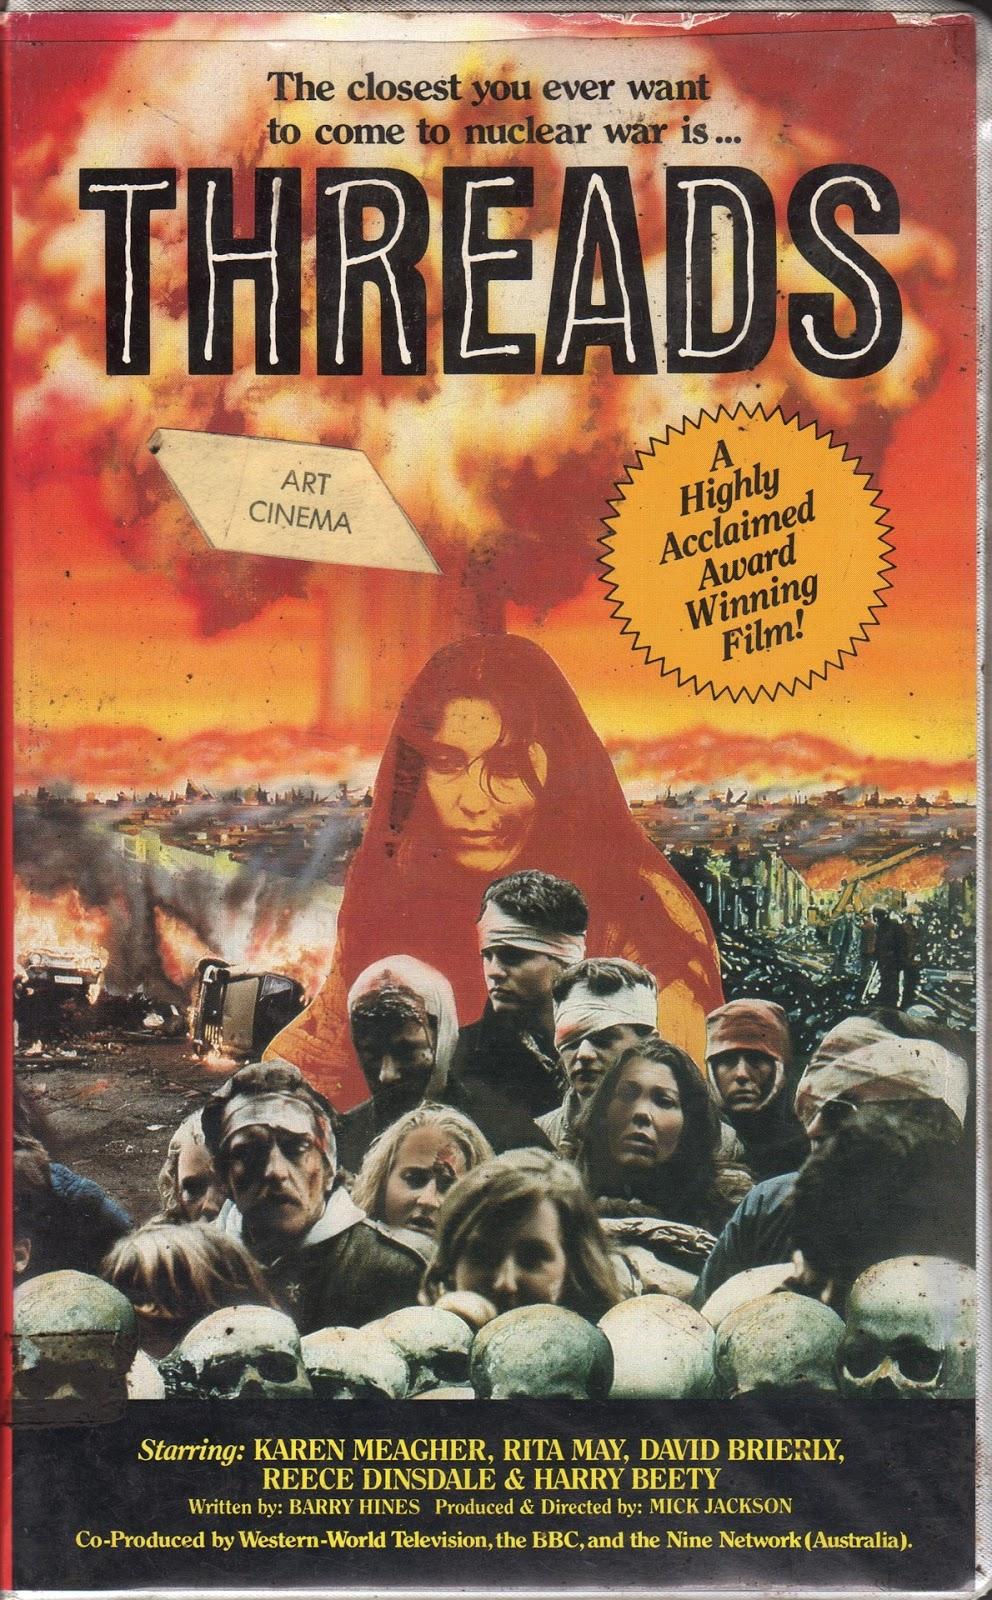 Threads movie nuclear